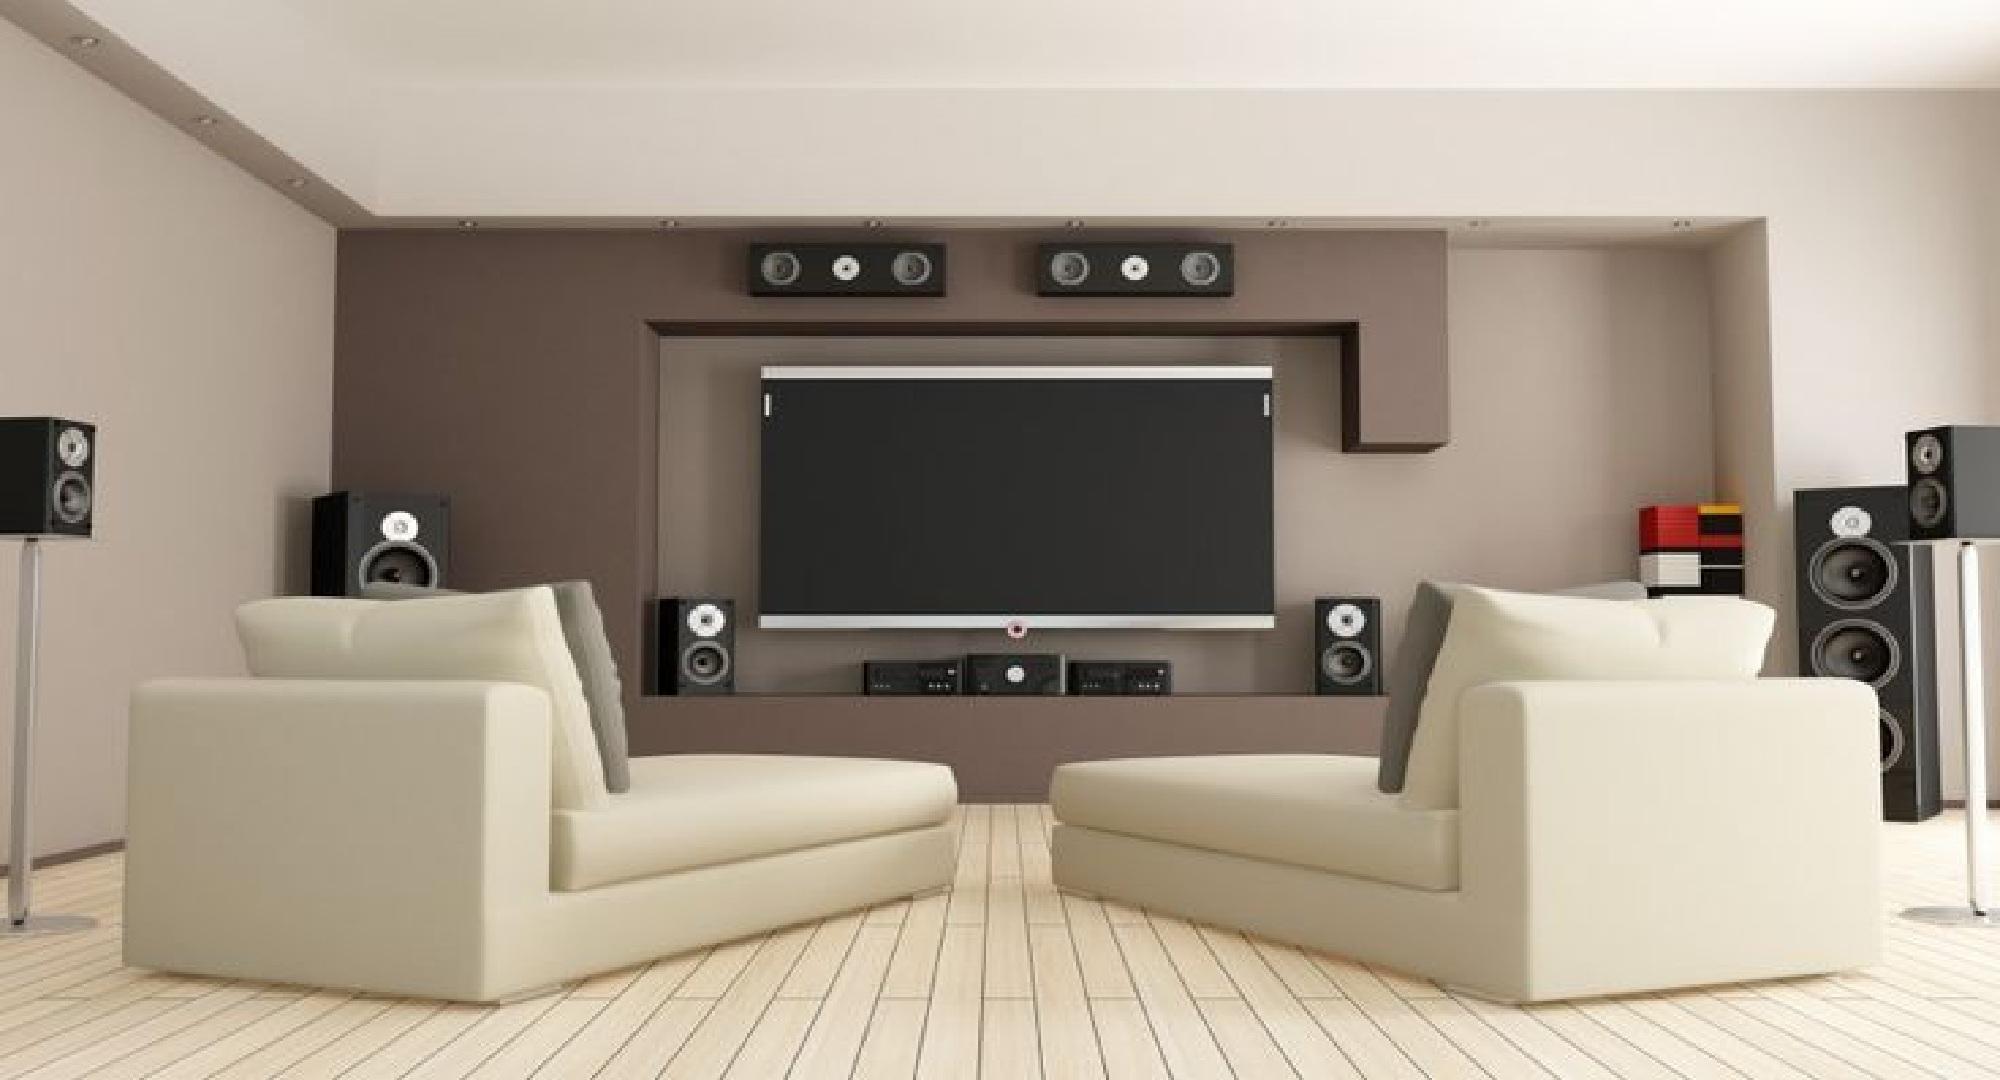 Projetando Sistemas de Audio&Video